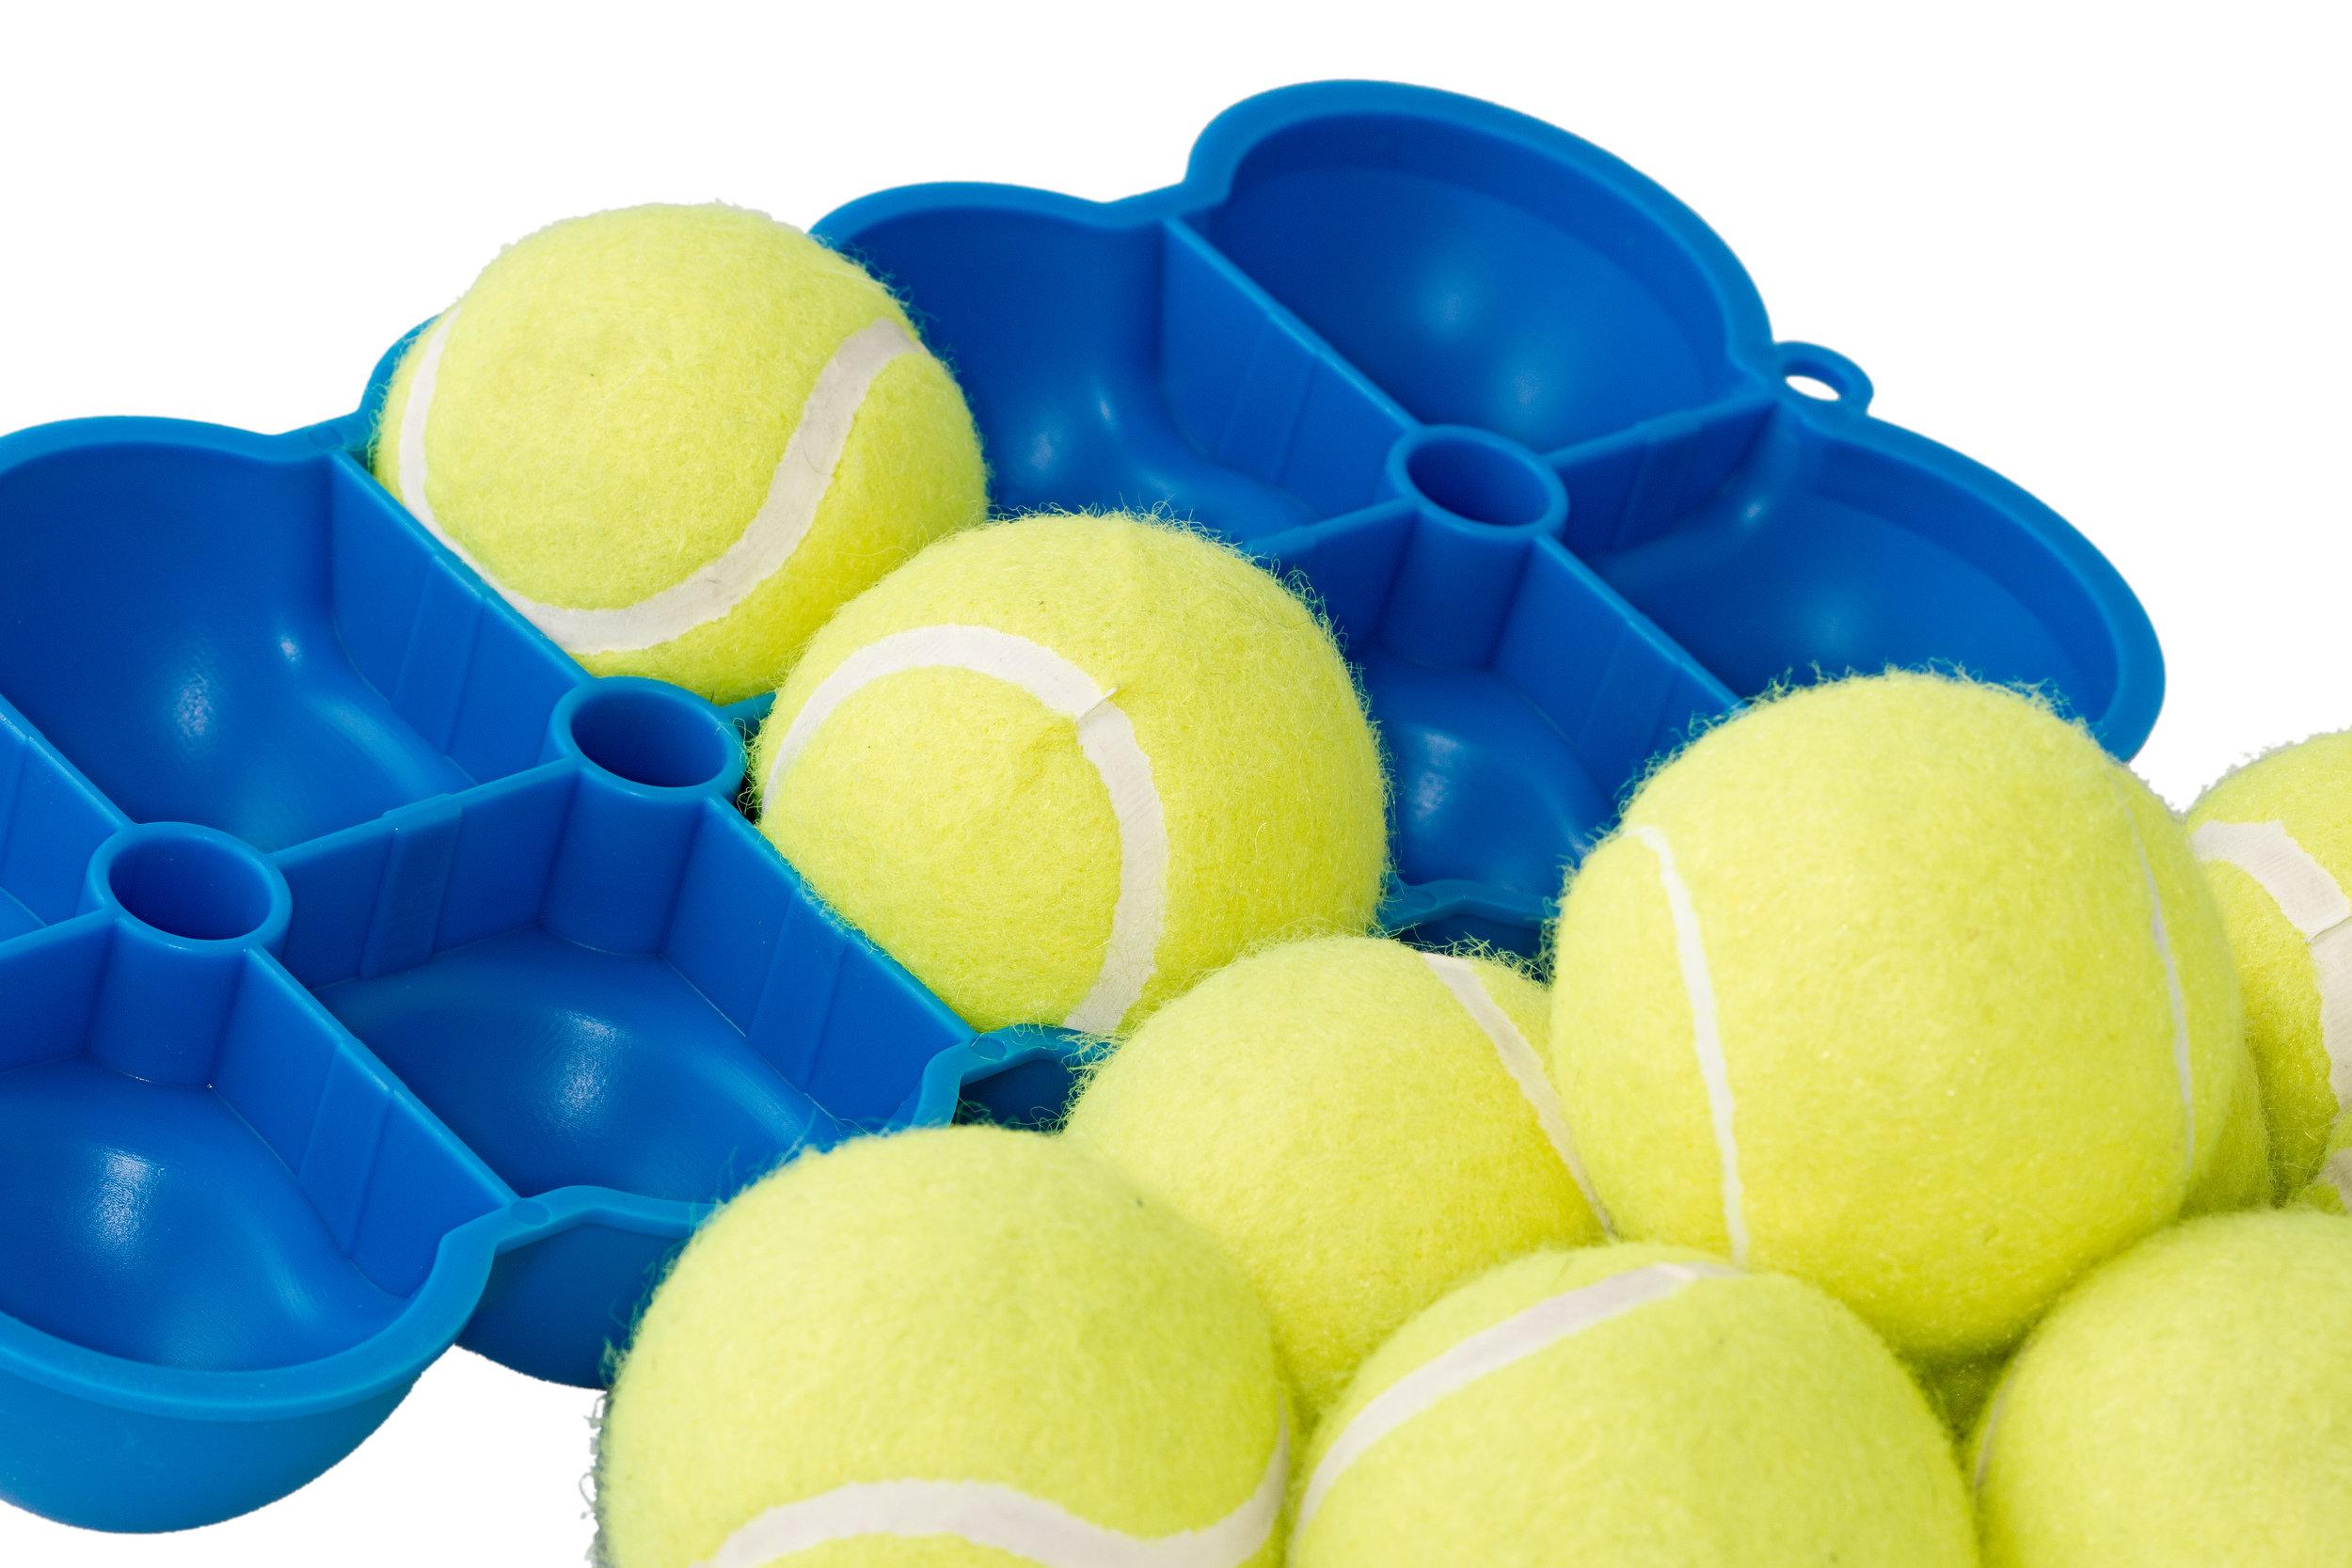 The Back King - Using Tennis Balls